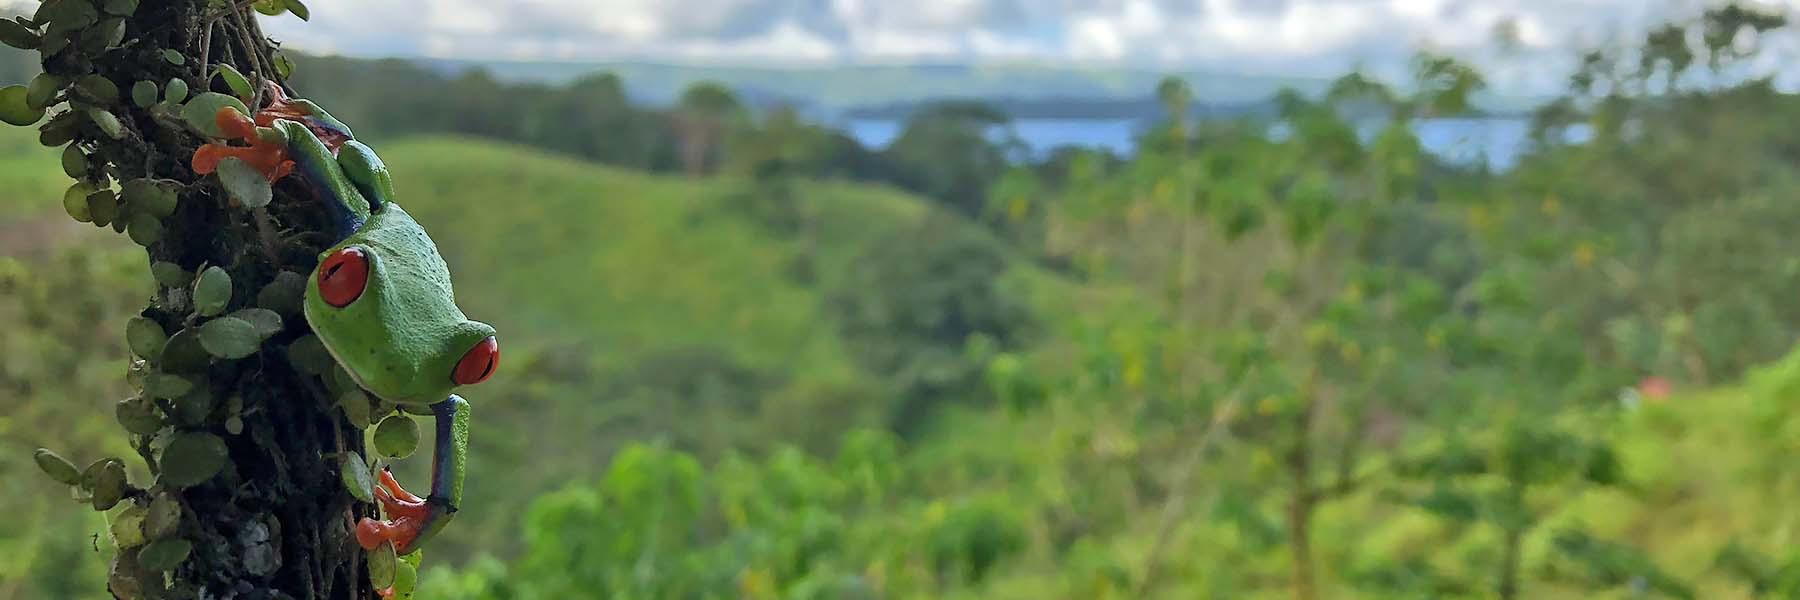 birding tours to costa rica